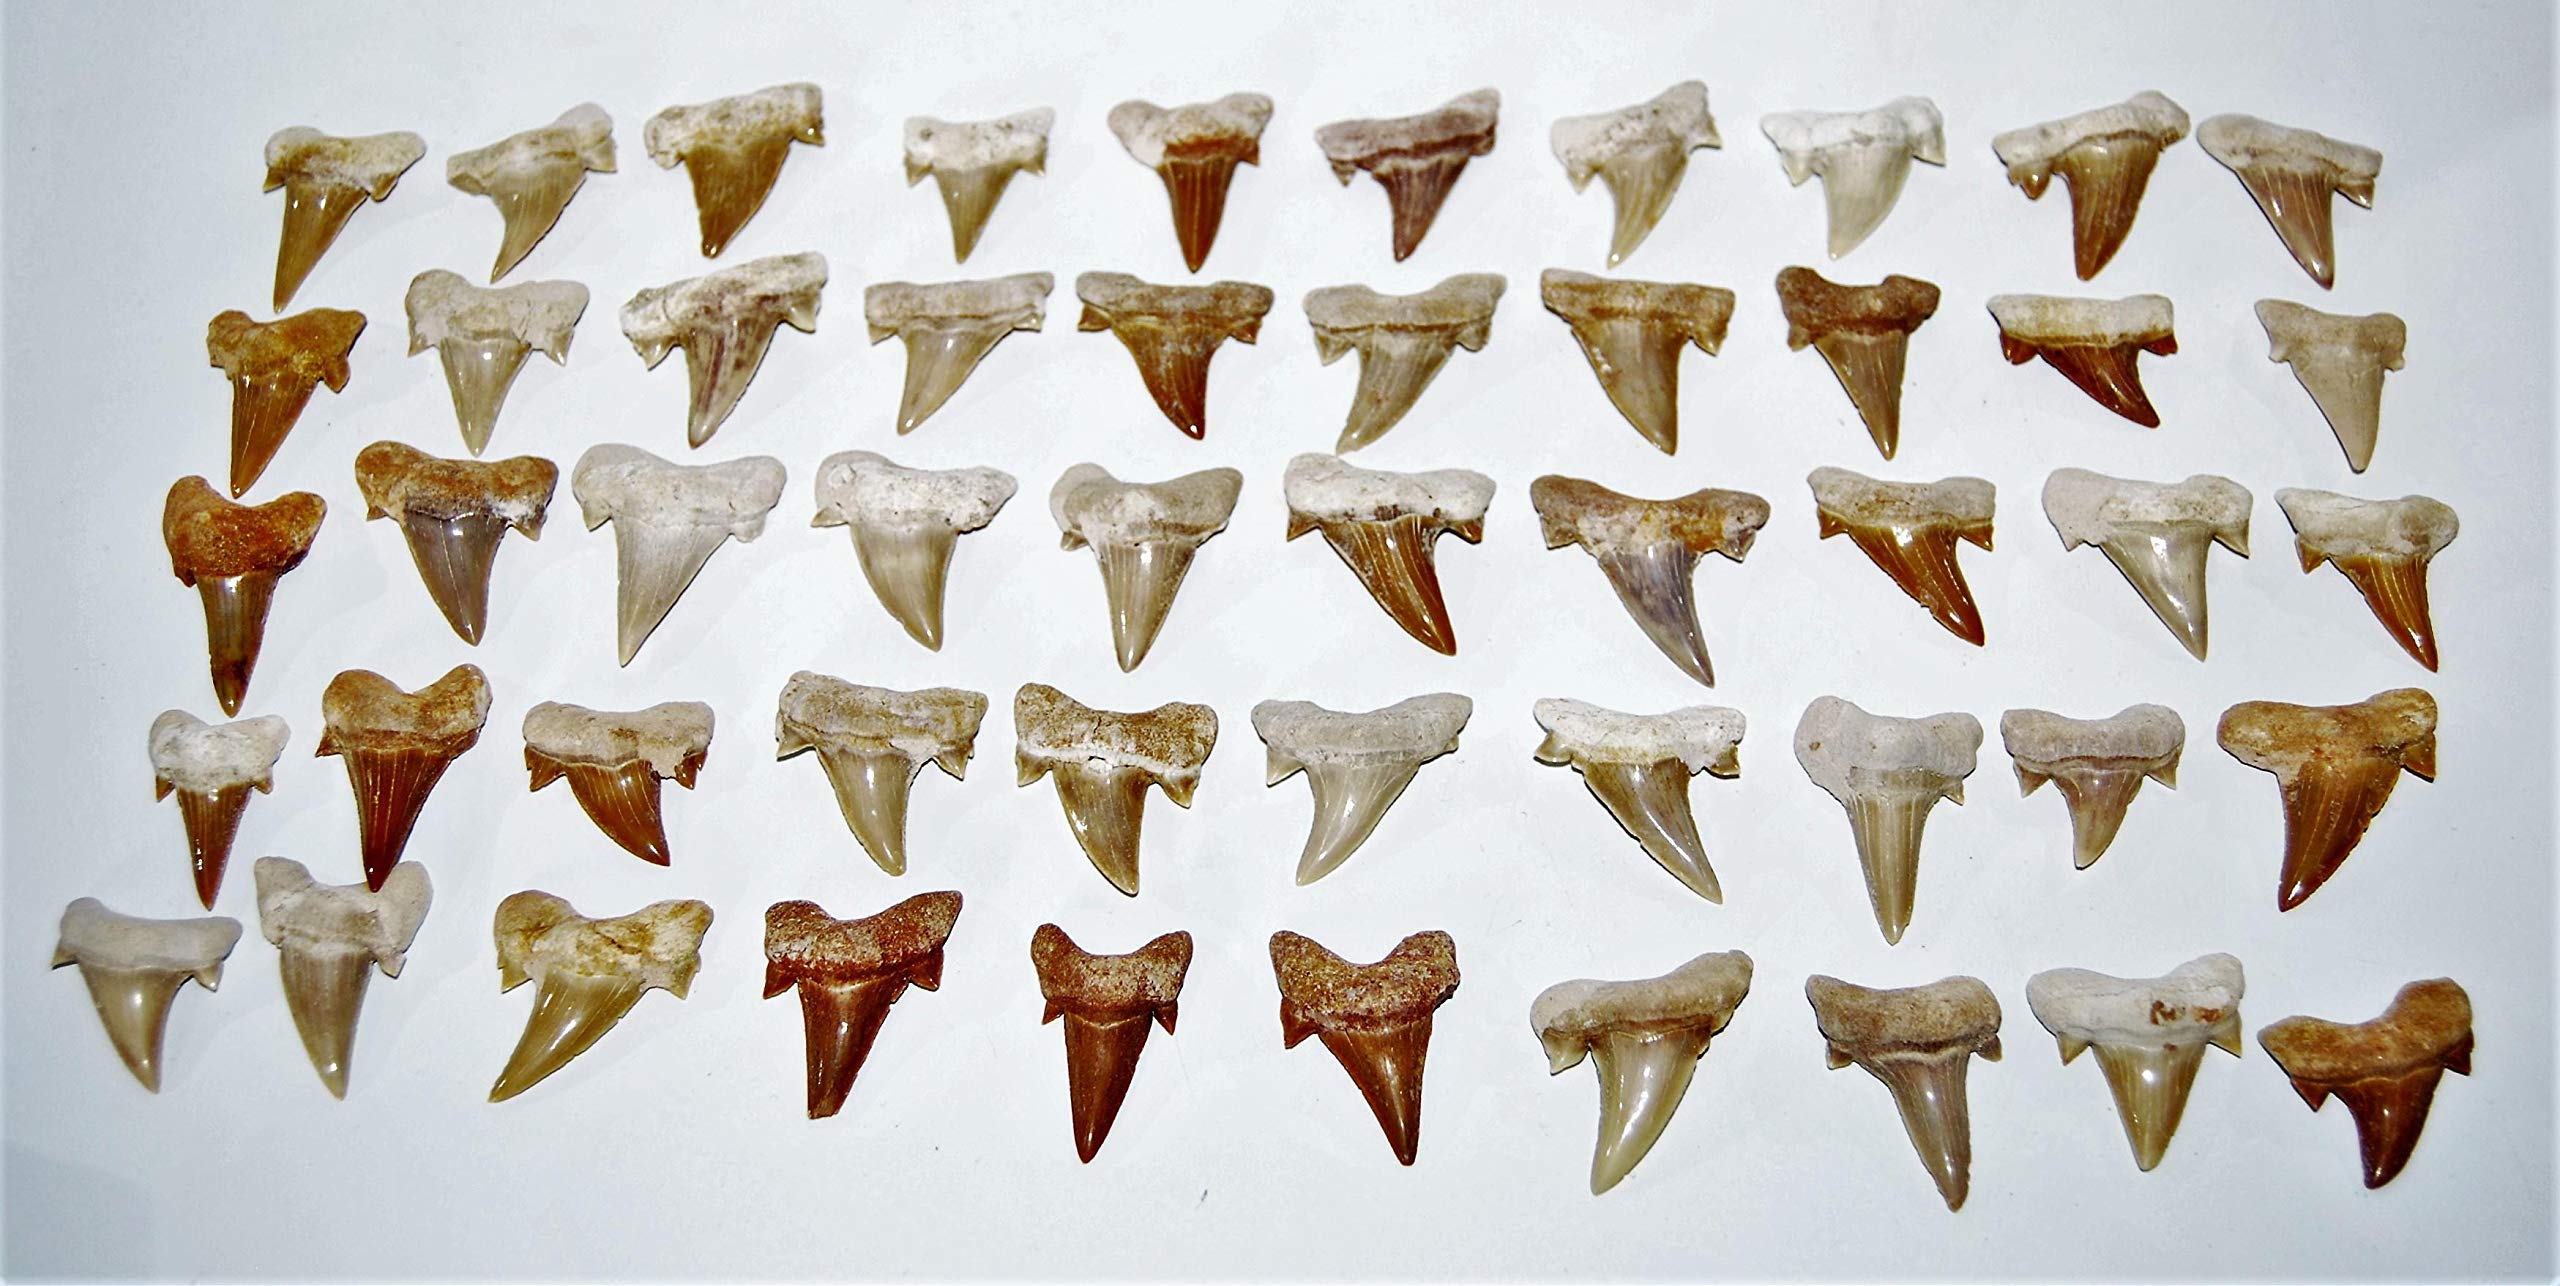 OTODUS Shark Tooth Real Fossils ¾-1 Inch (S) Lot of 50 Teeth B Grade 14513